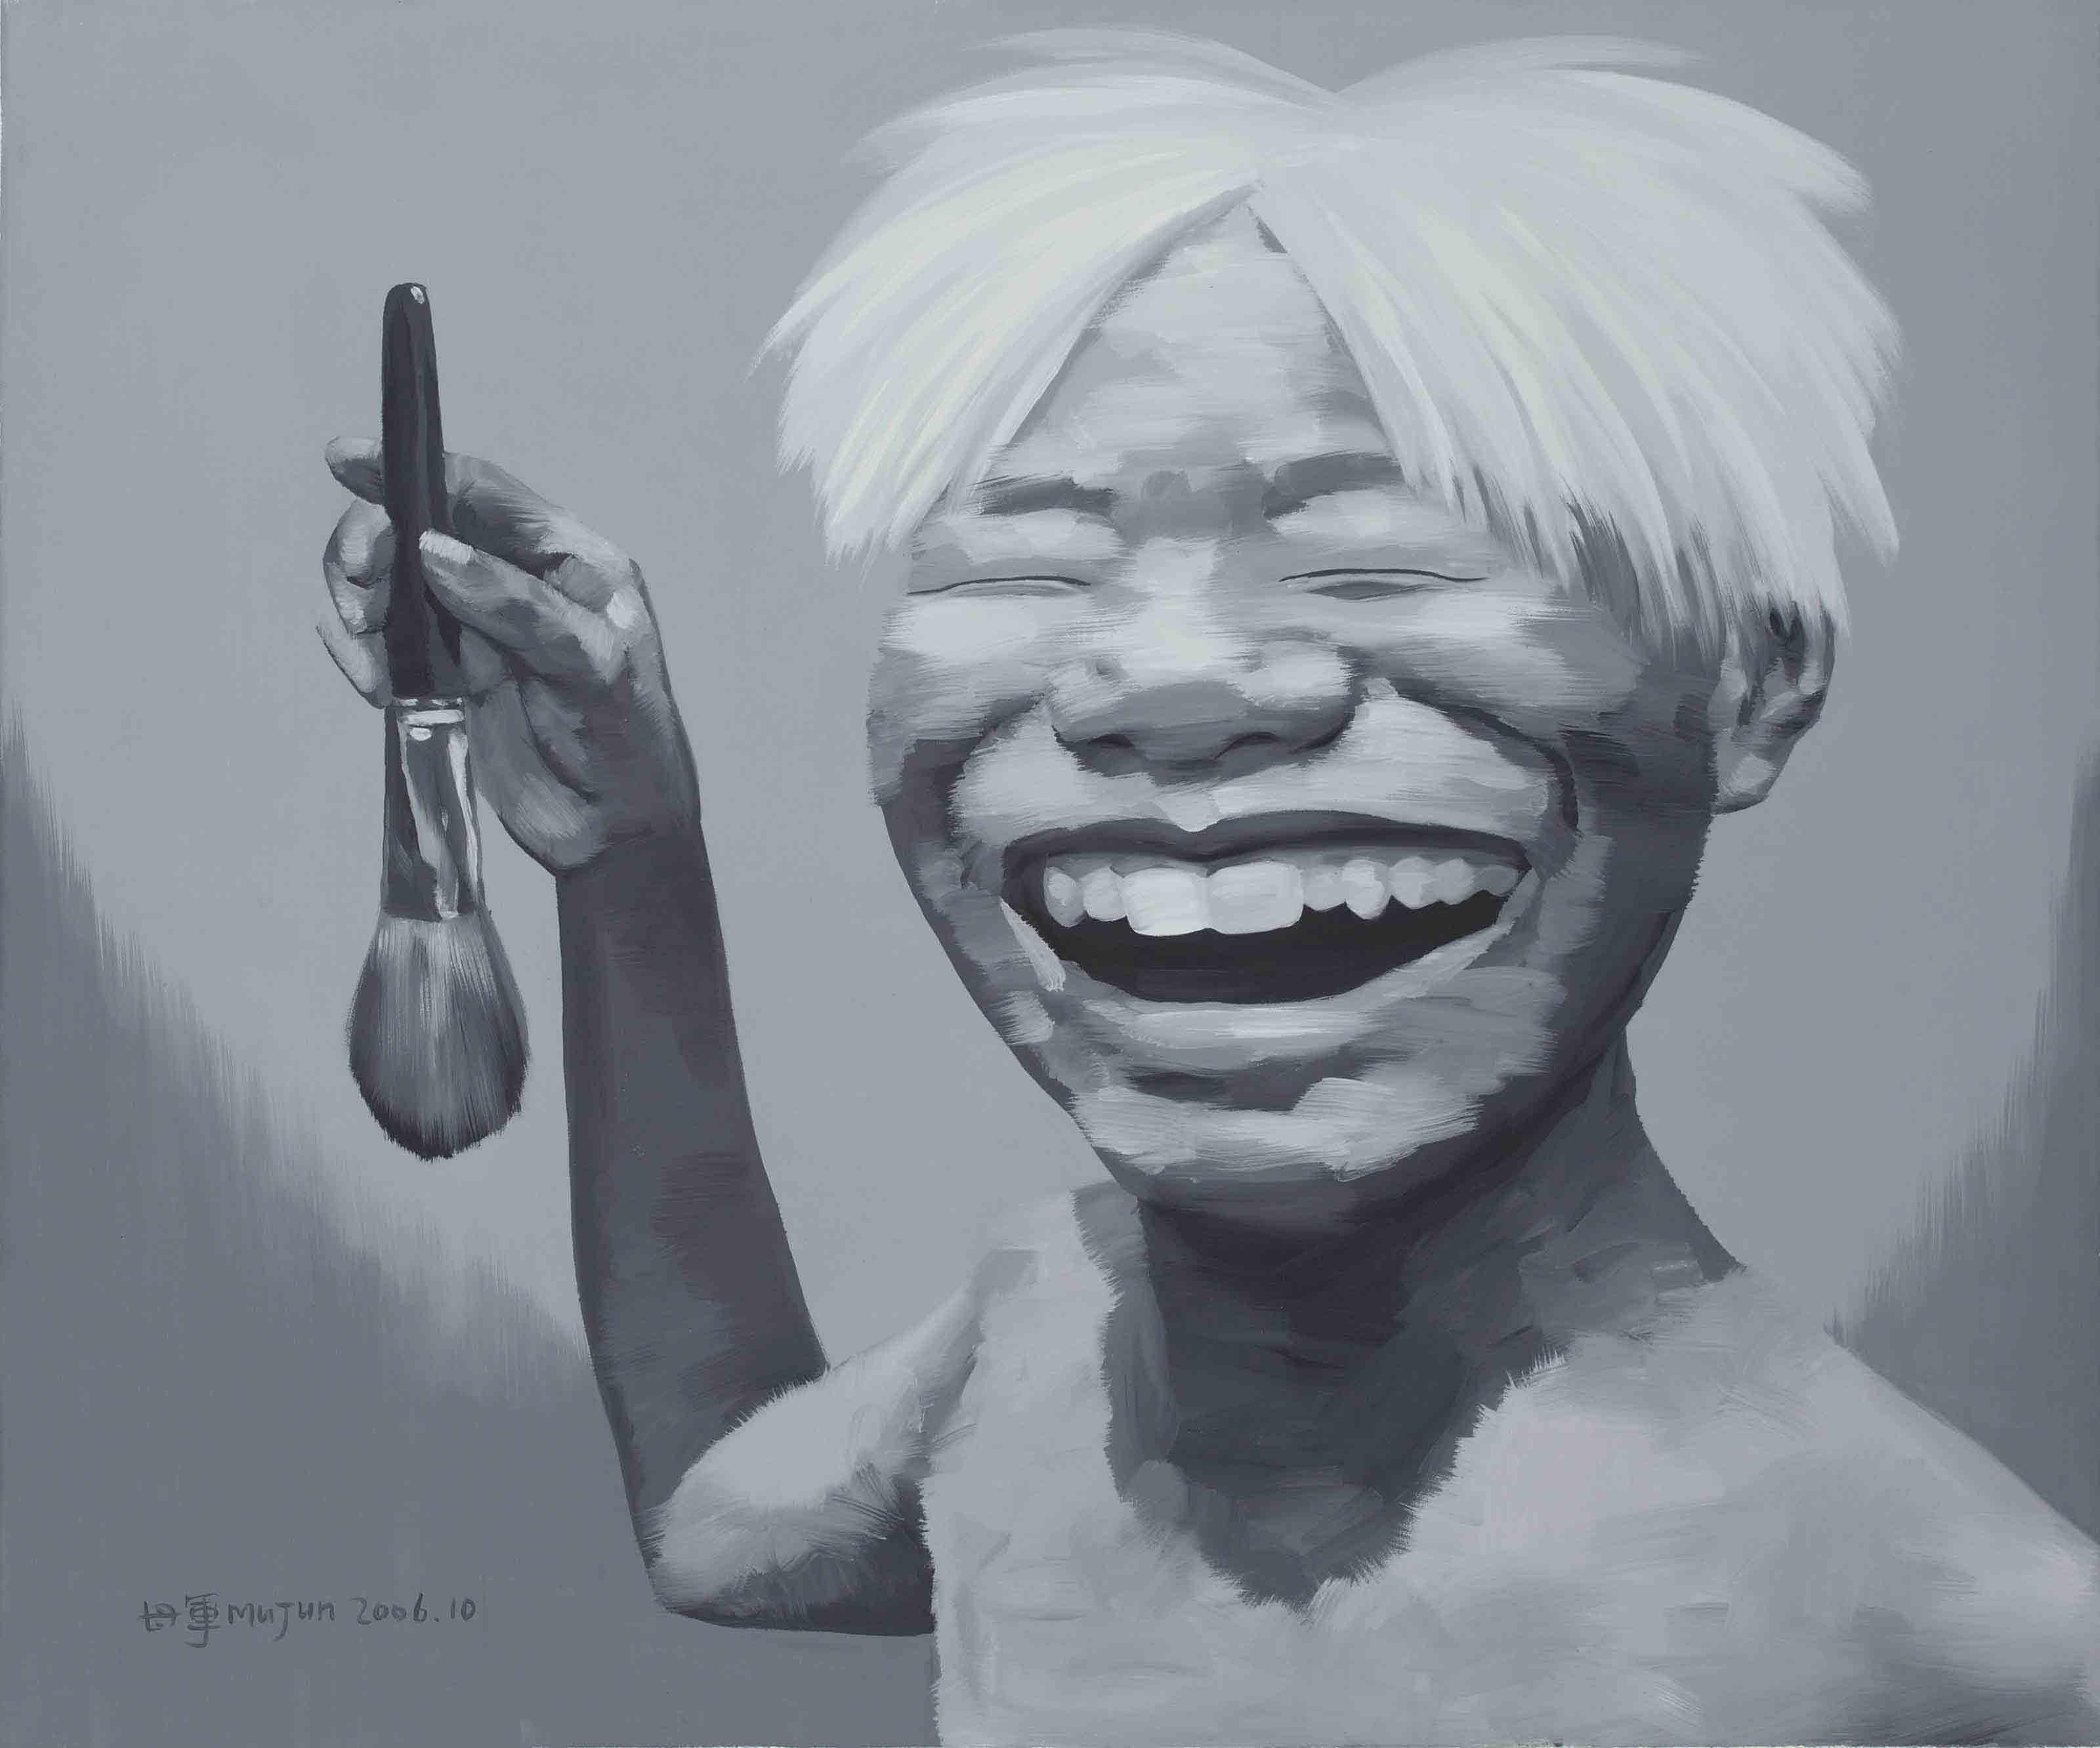 Self-portrait as Andy Warhol